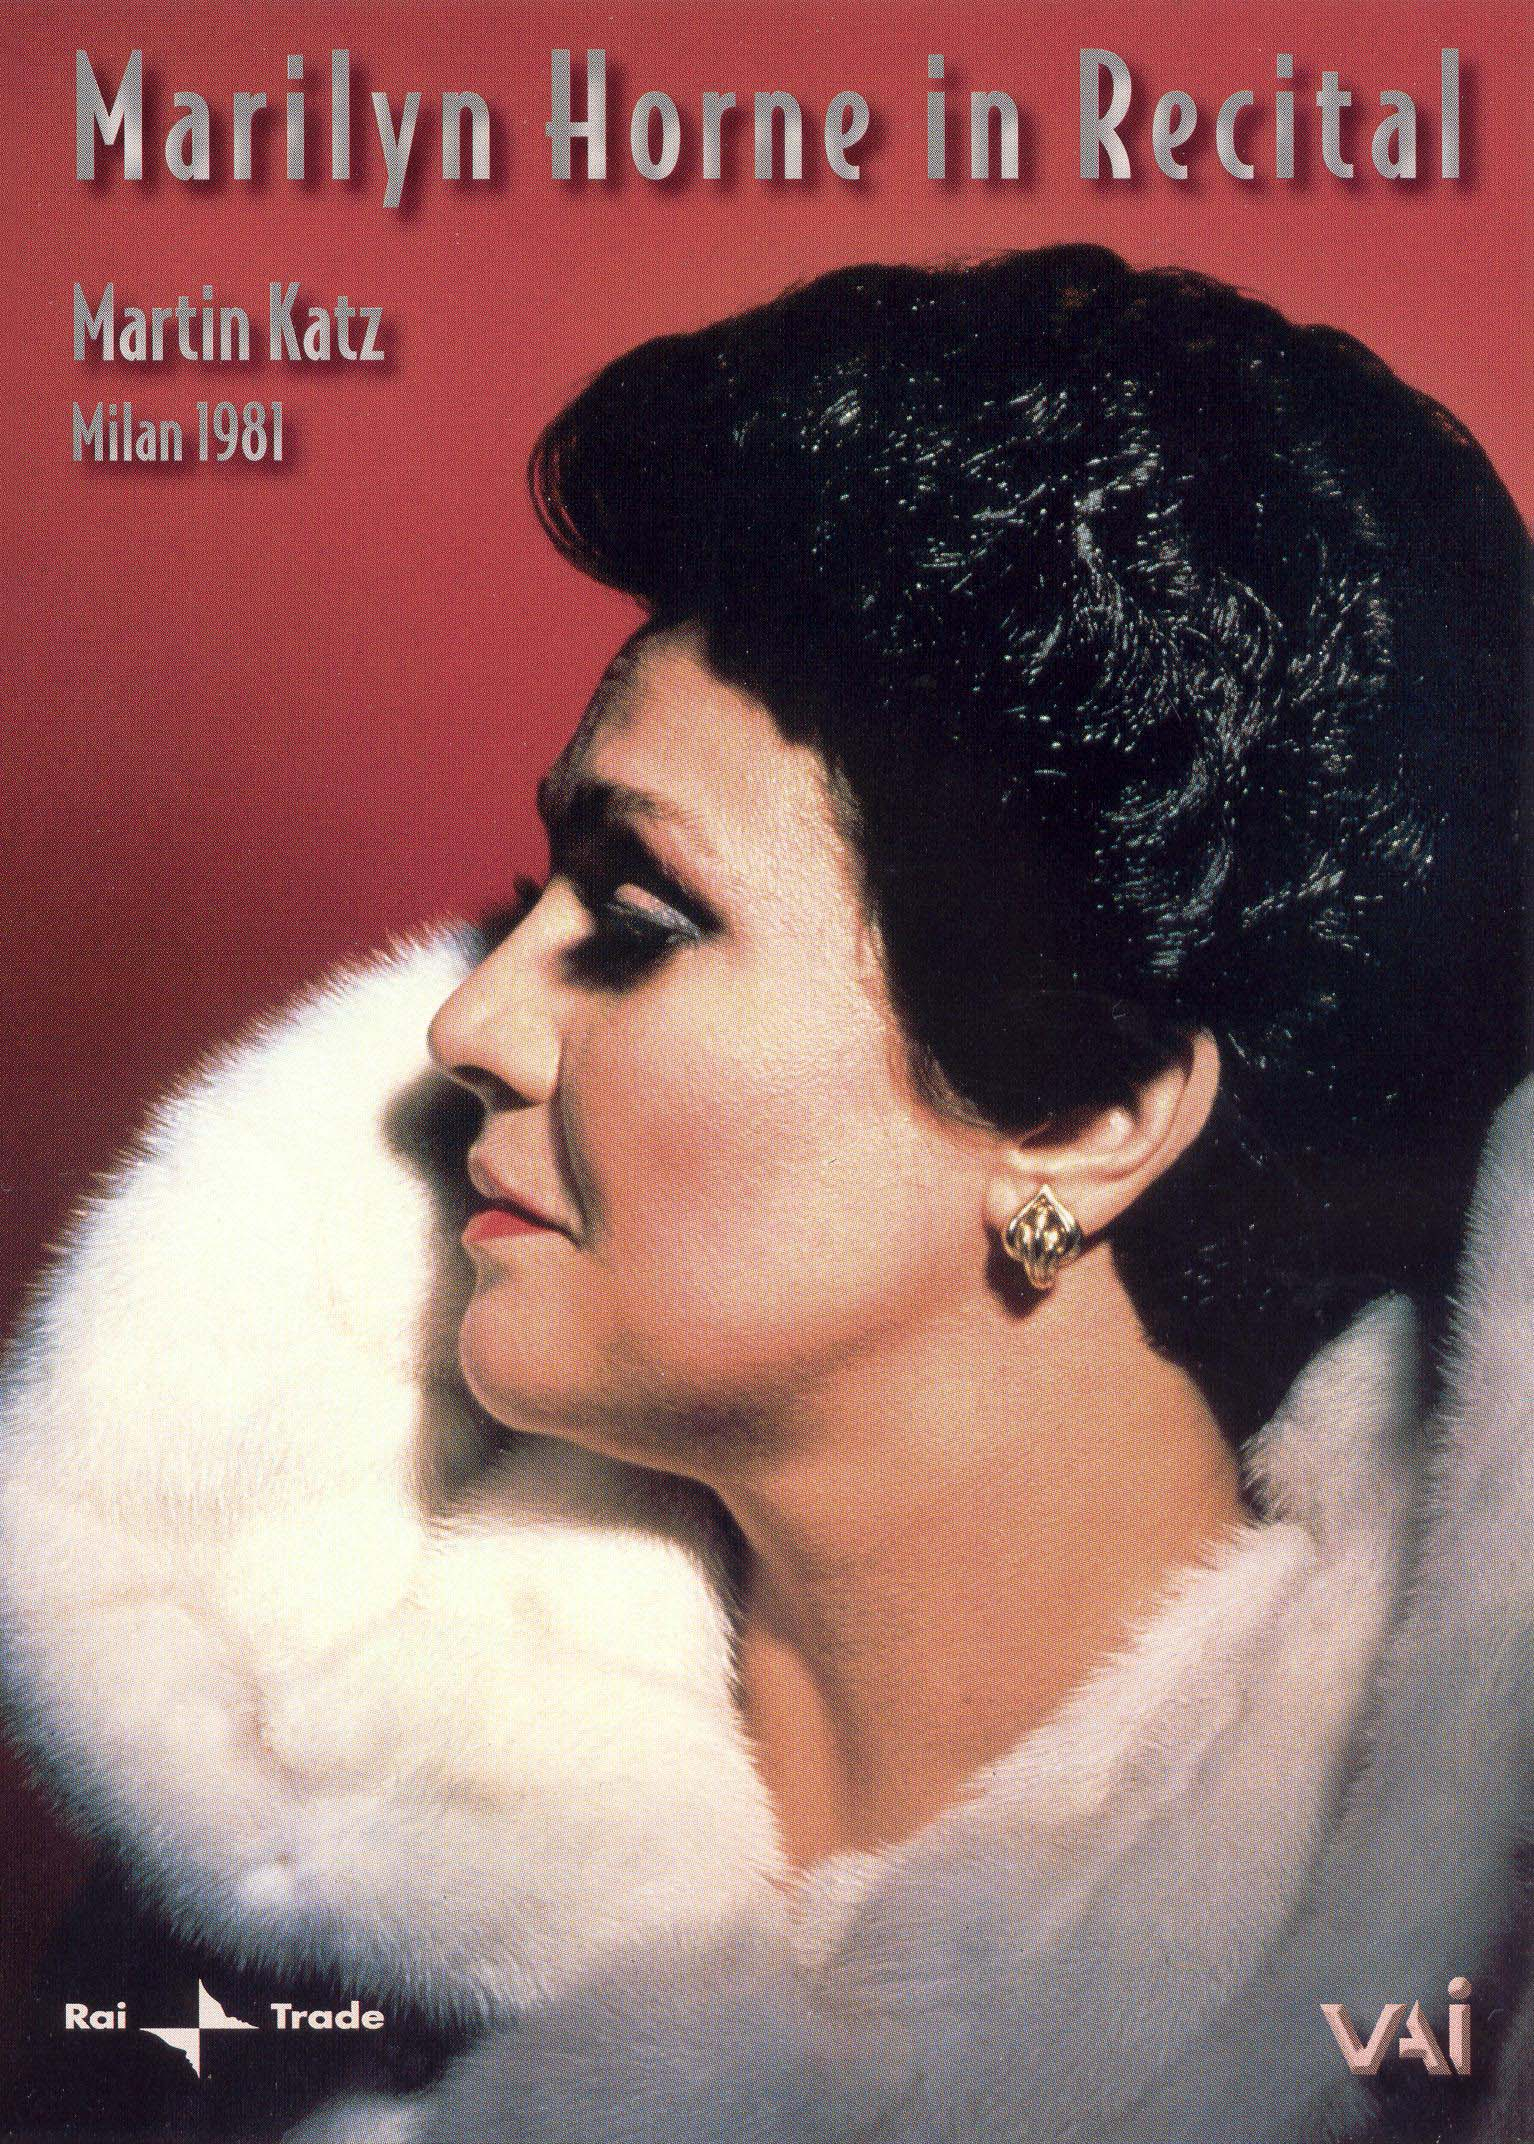 Marilyn Horne at La Scala